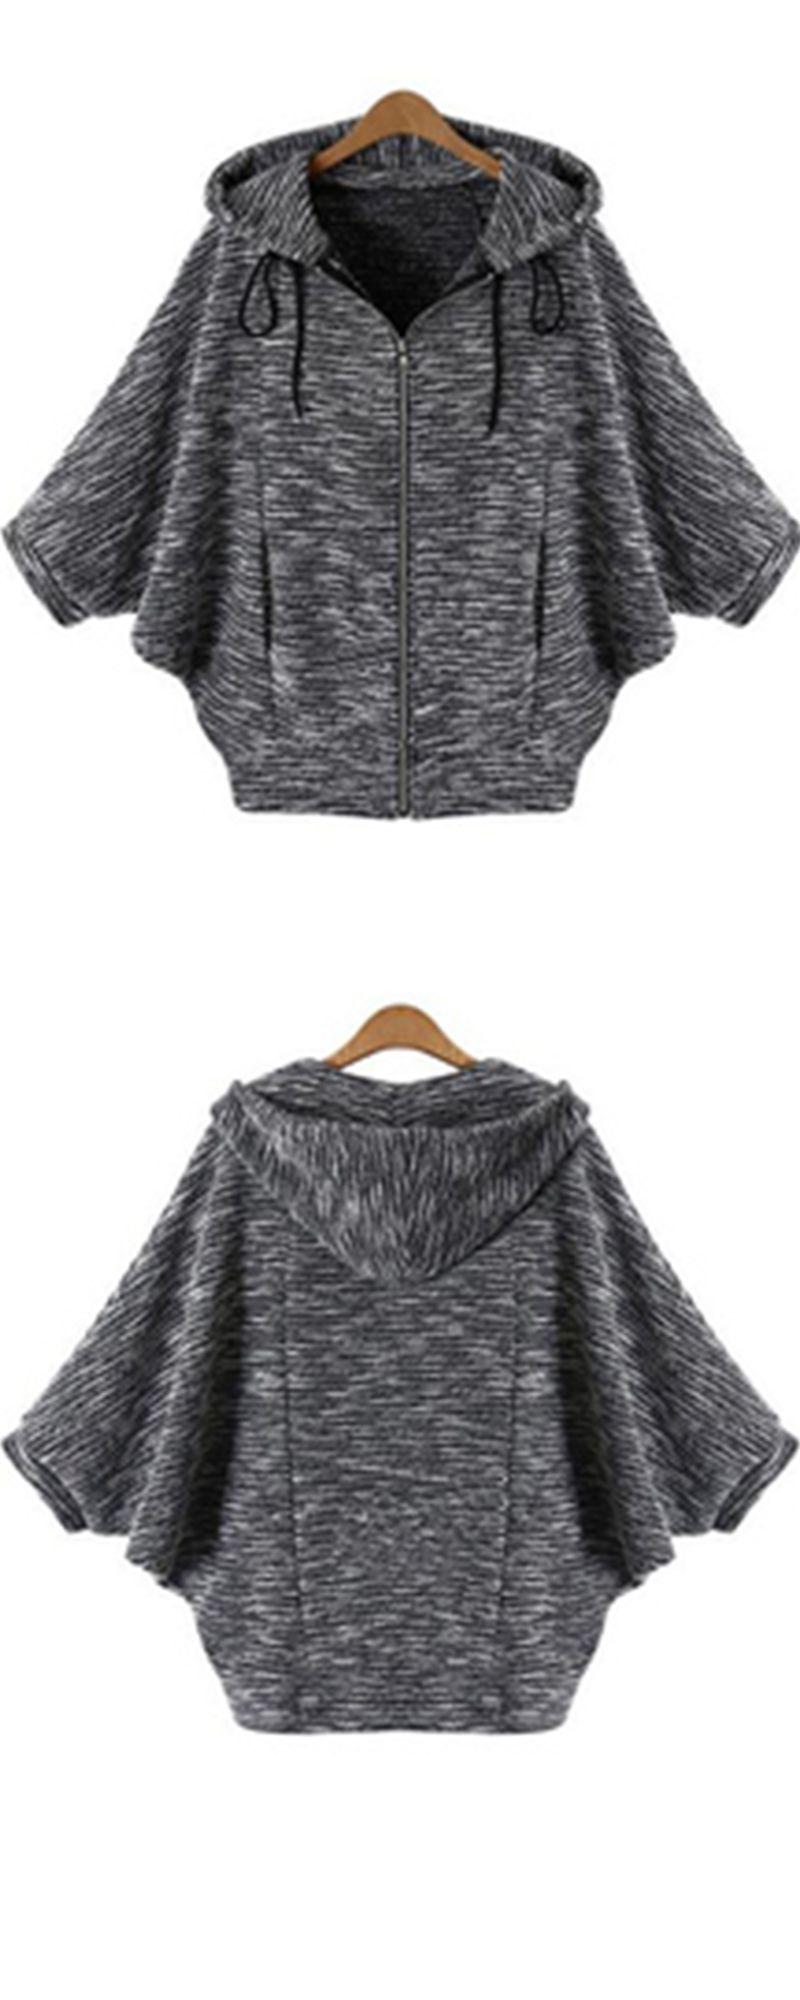 Black Hooded Batwing Sleeve Sweater Coat | Casual styles, Hoods ...